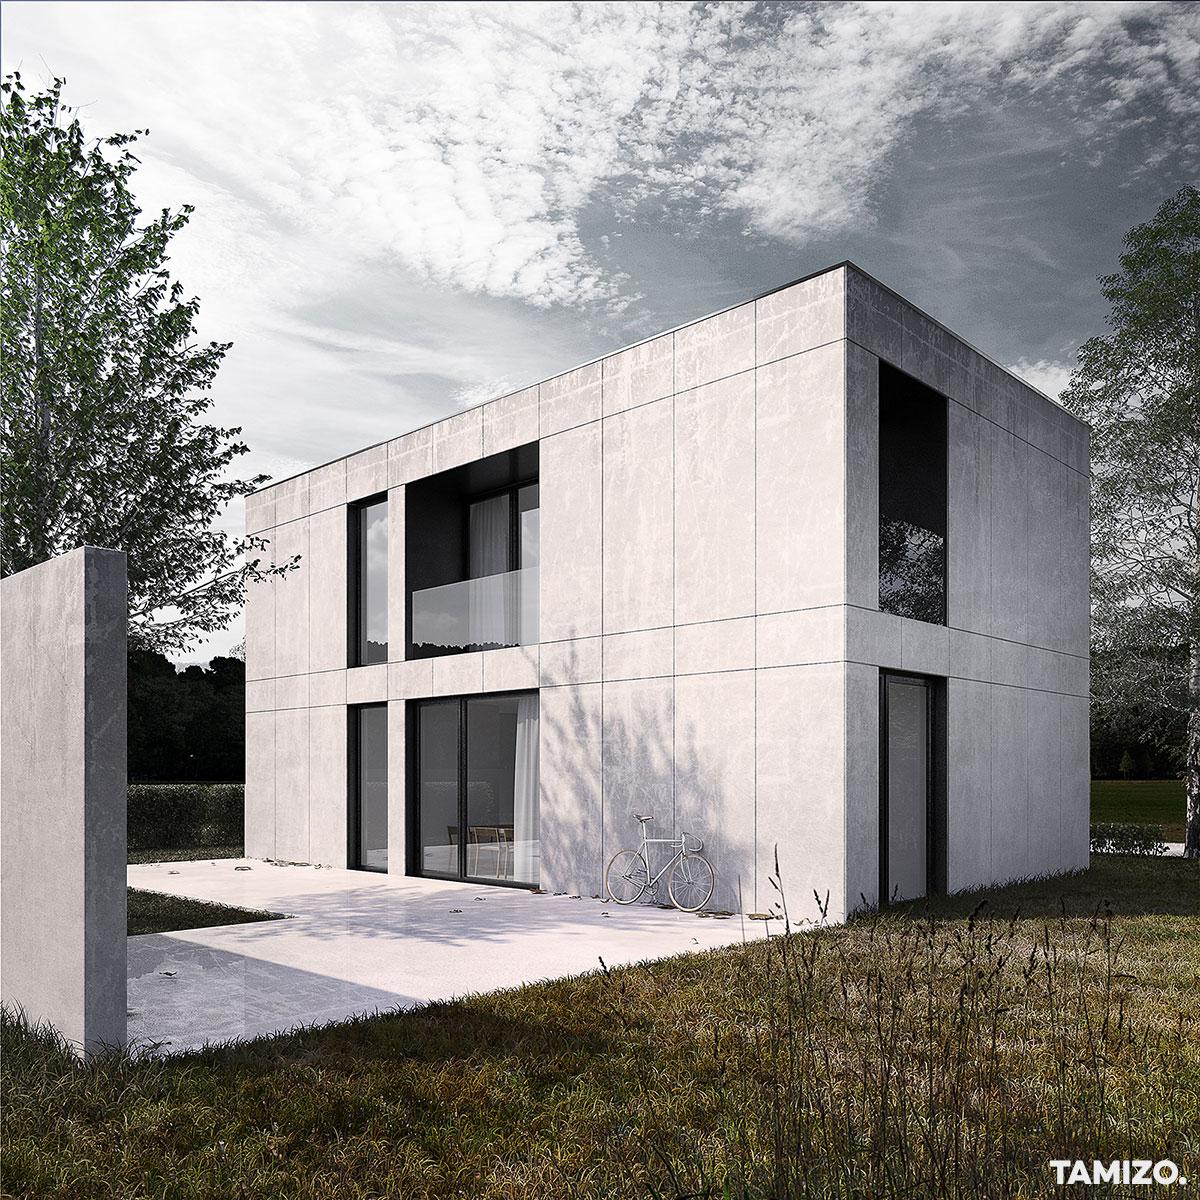 A063_tamizo_architects_mateusz_kuo_stolarski_dom_projekt_wojtka_pabianice_maly_domek_03